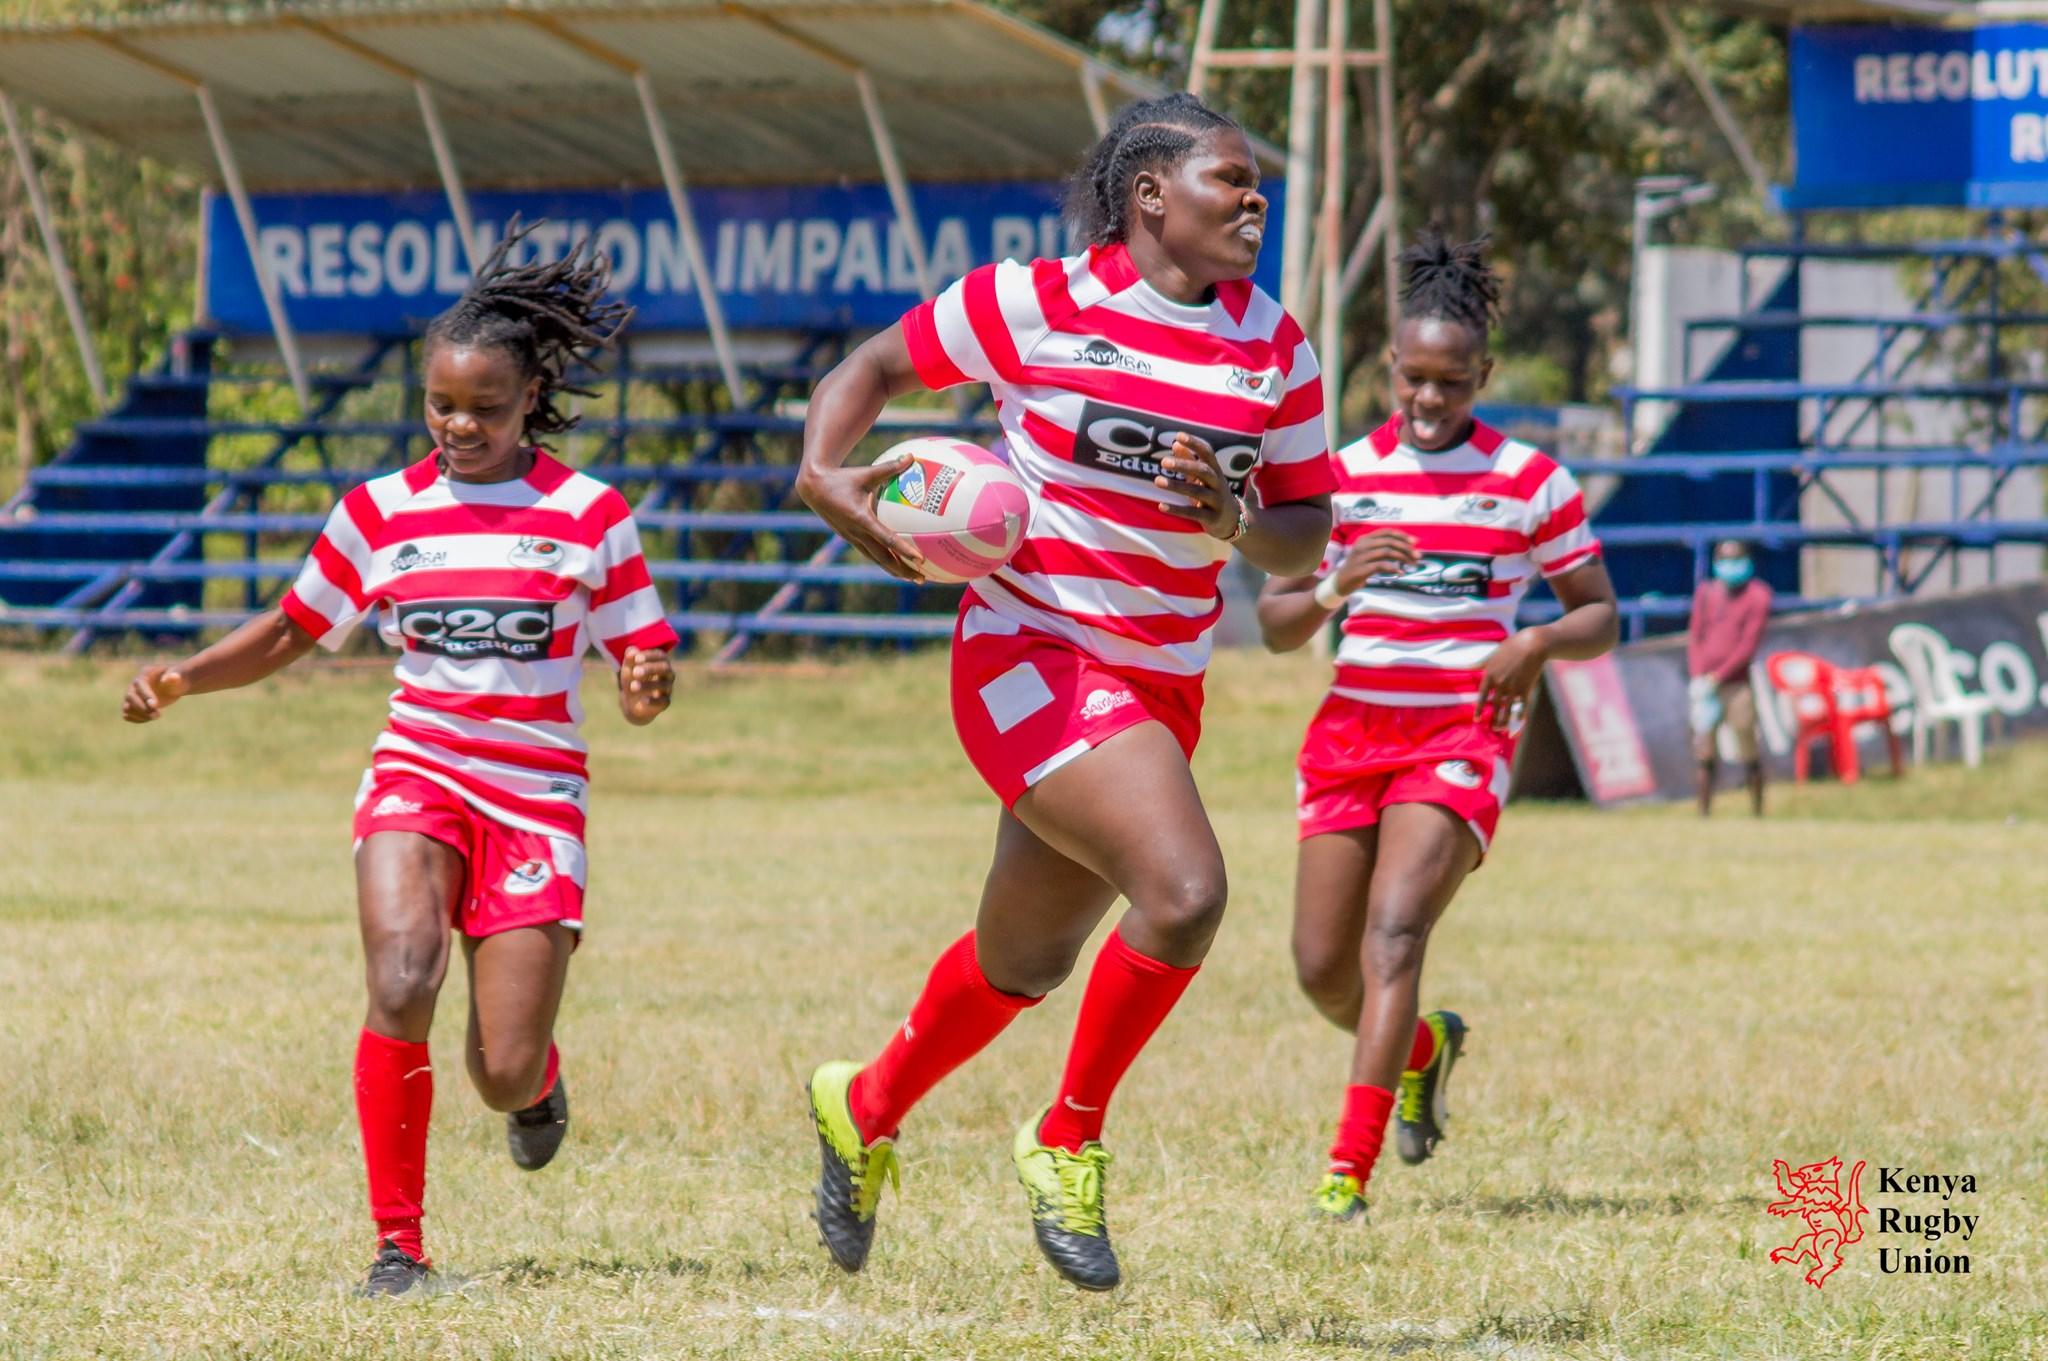 Impala maintain lead as KRU women's festival heads to round three